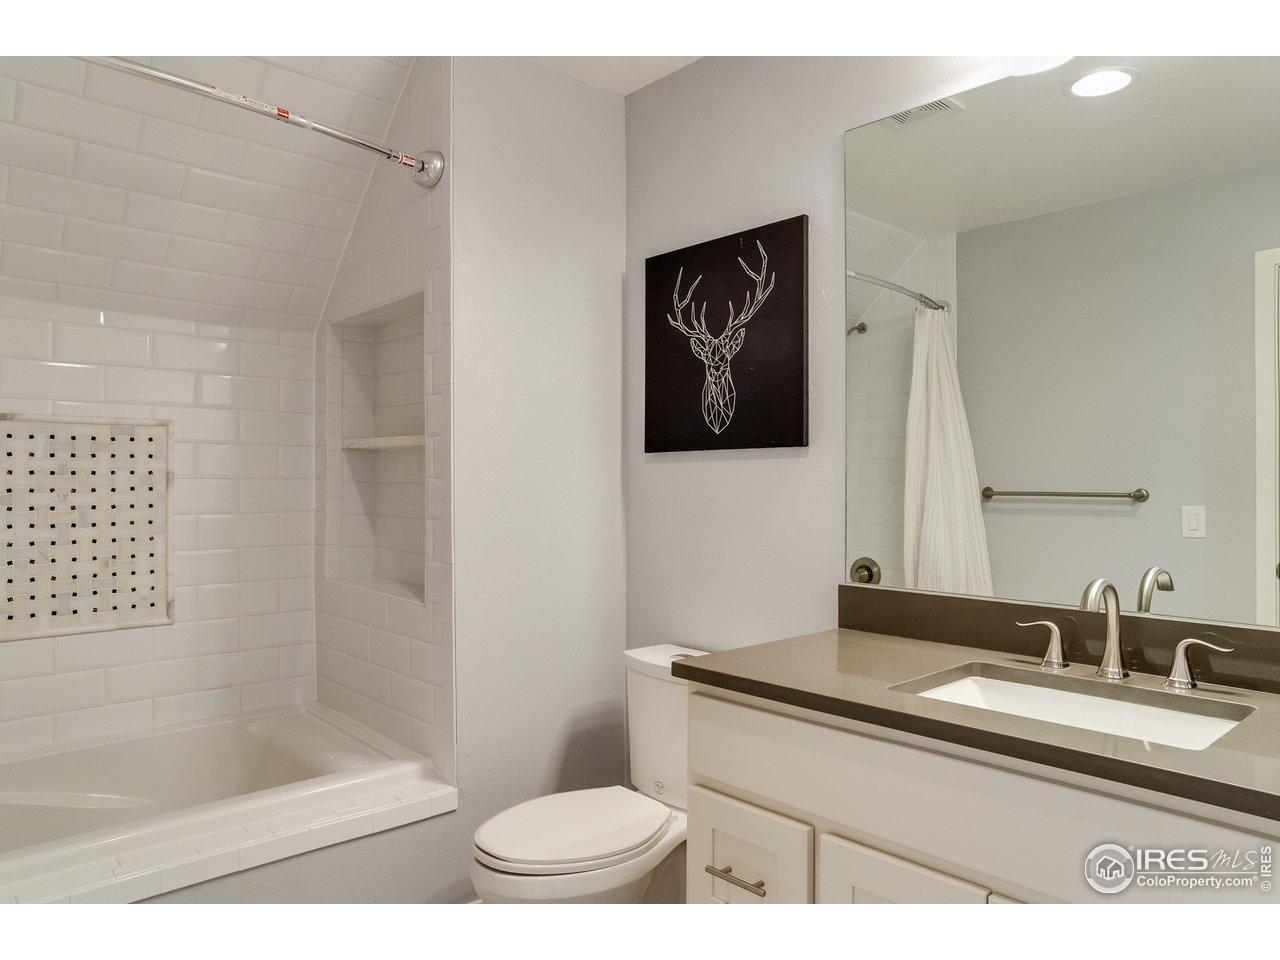 2nd Upstairs Full Bath